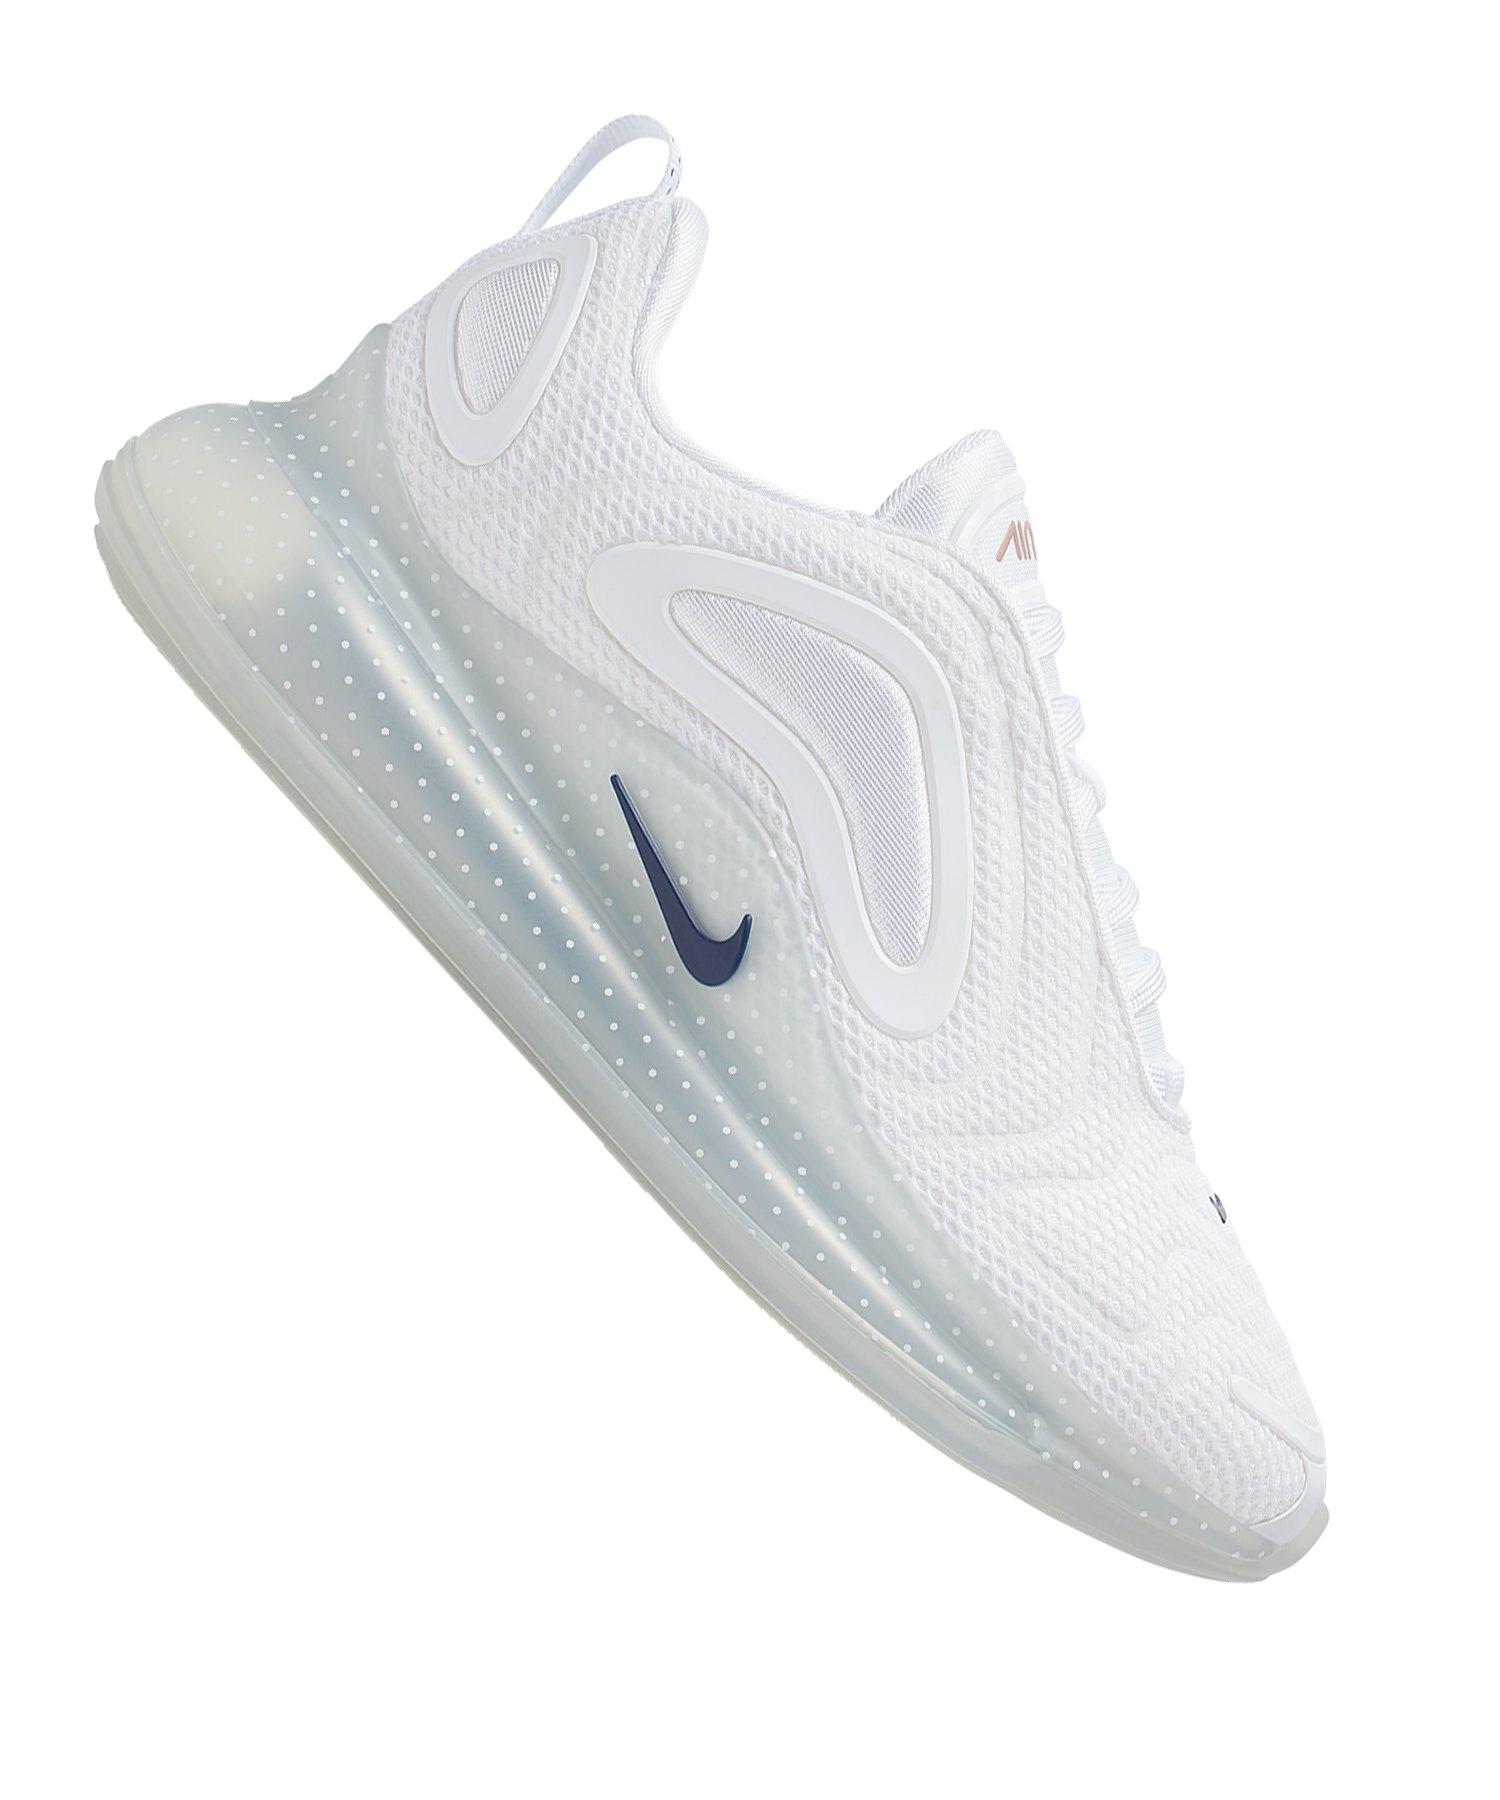 Nike Air Max 720 'Unité Totale' Damen | JD Sports